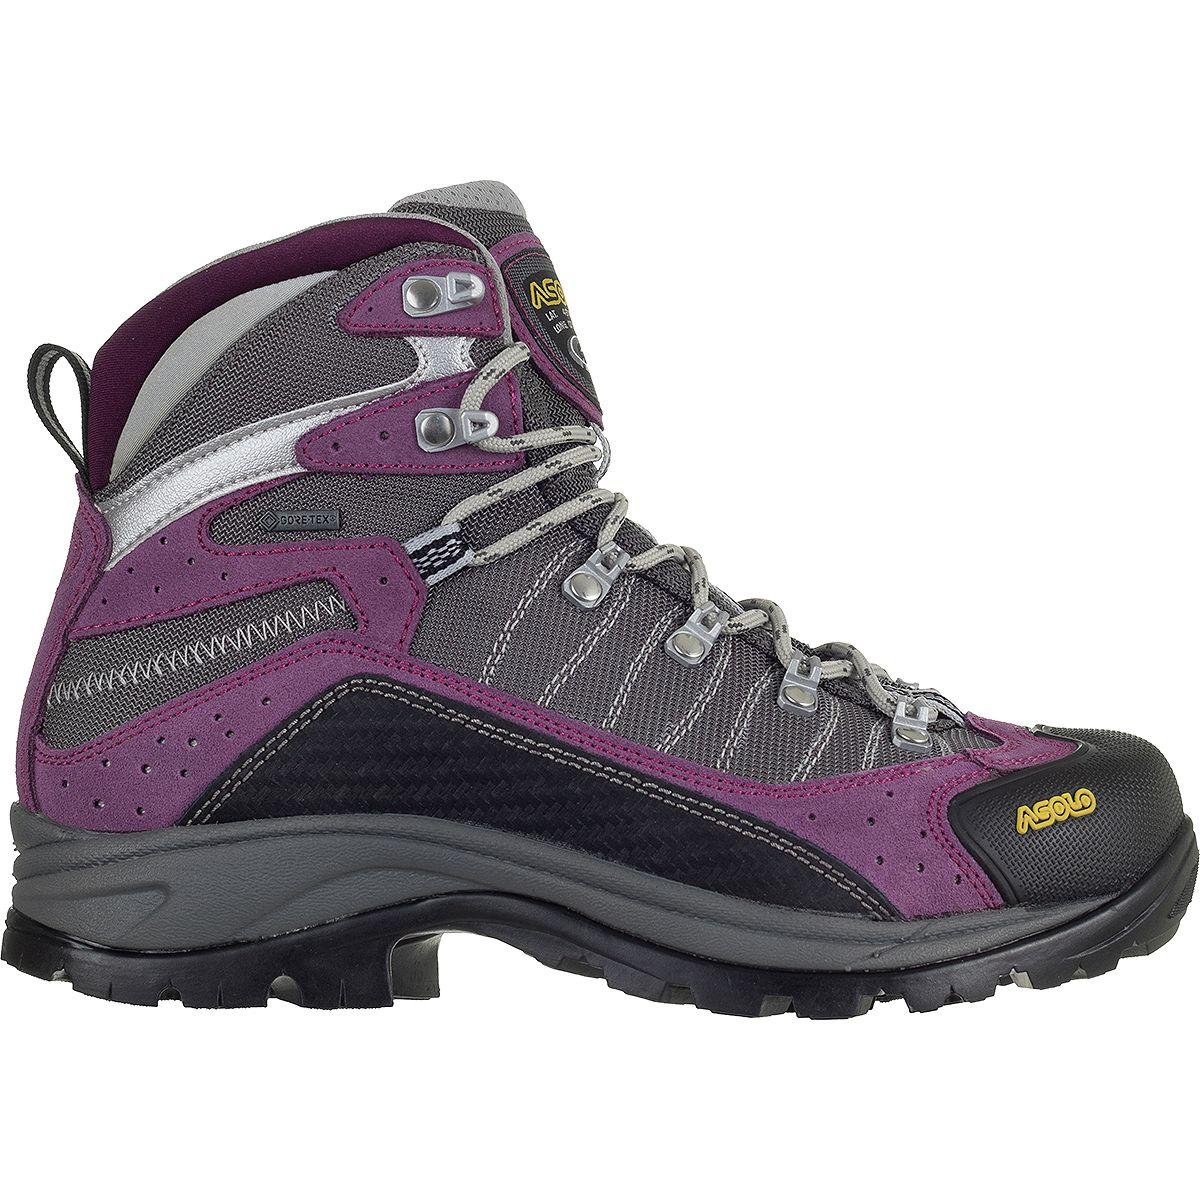 Asolo Drifter GV Backpacking Boot - Women's